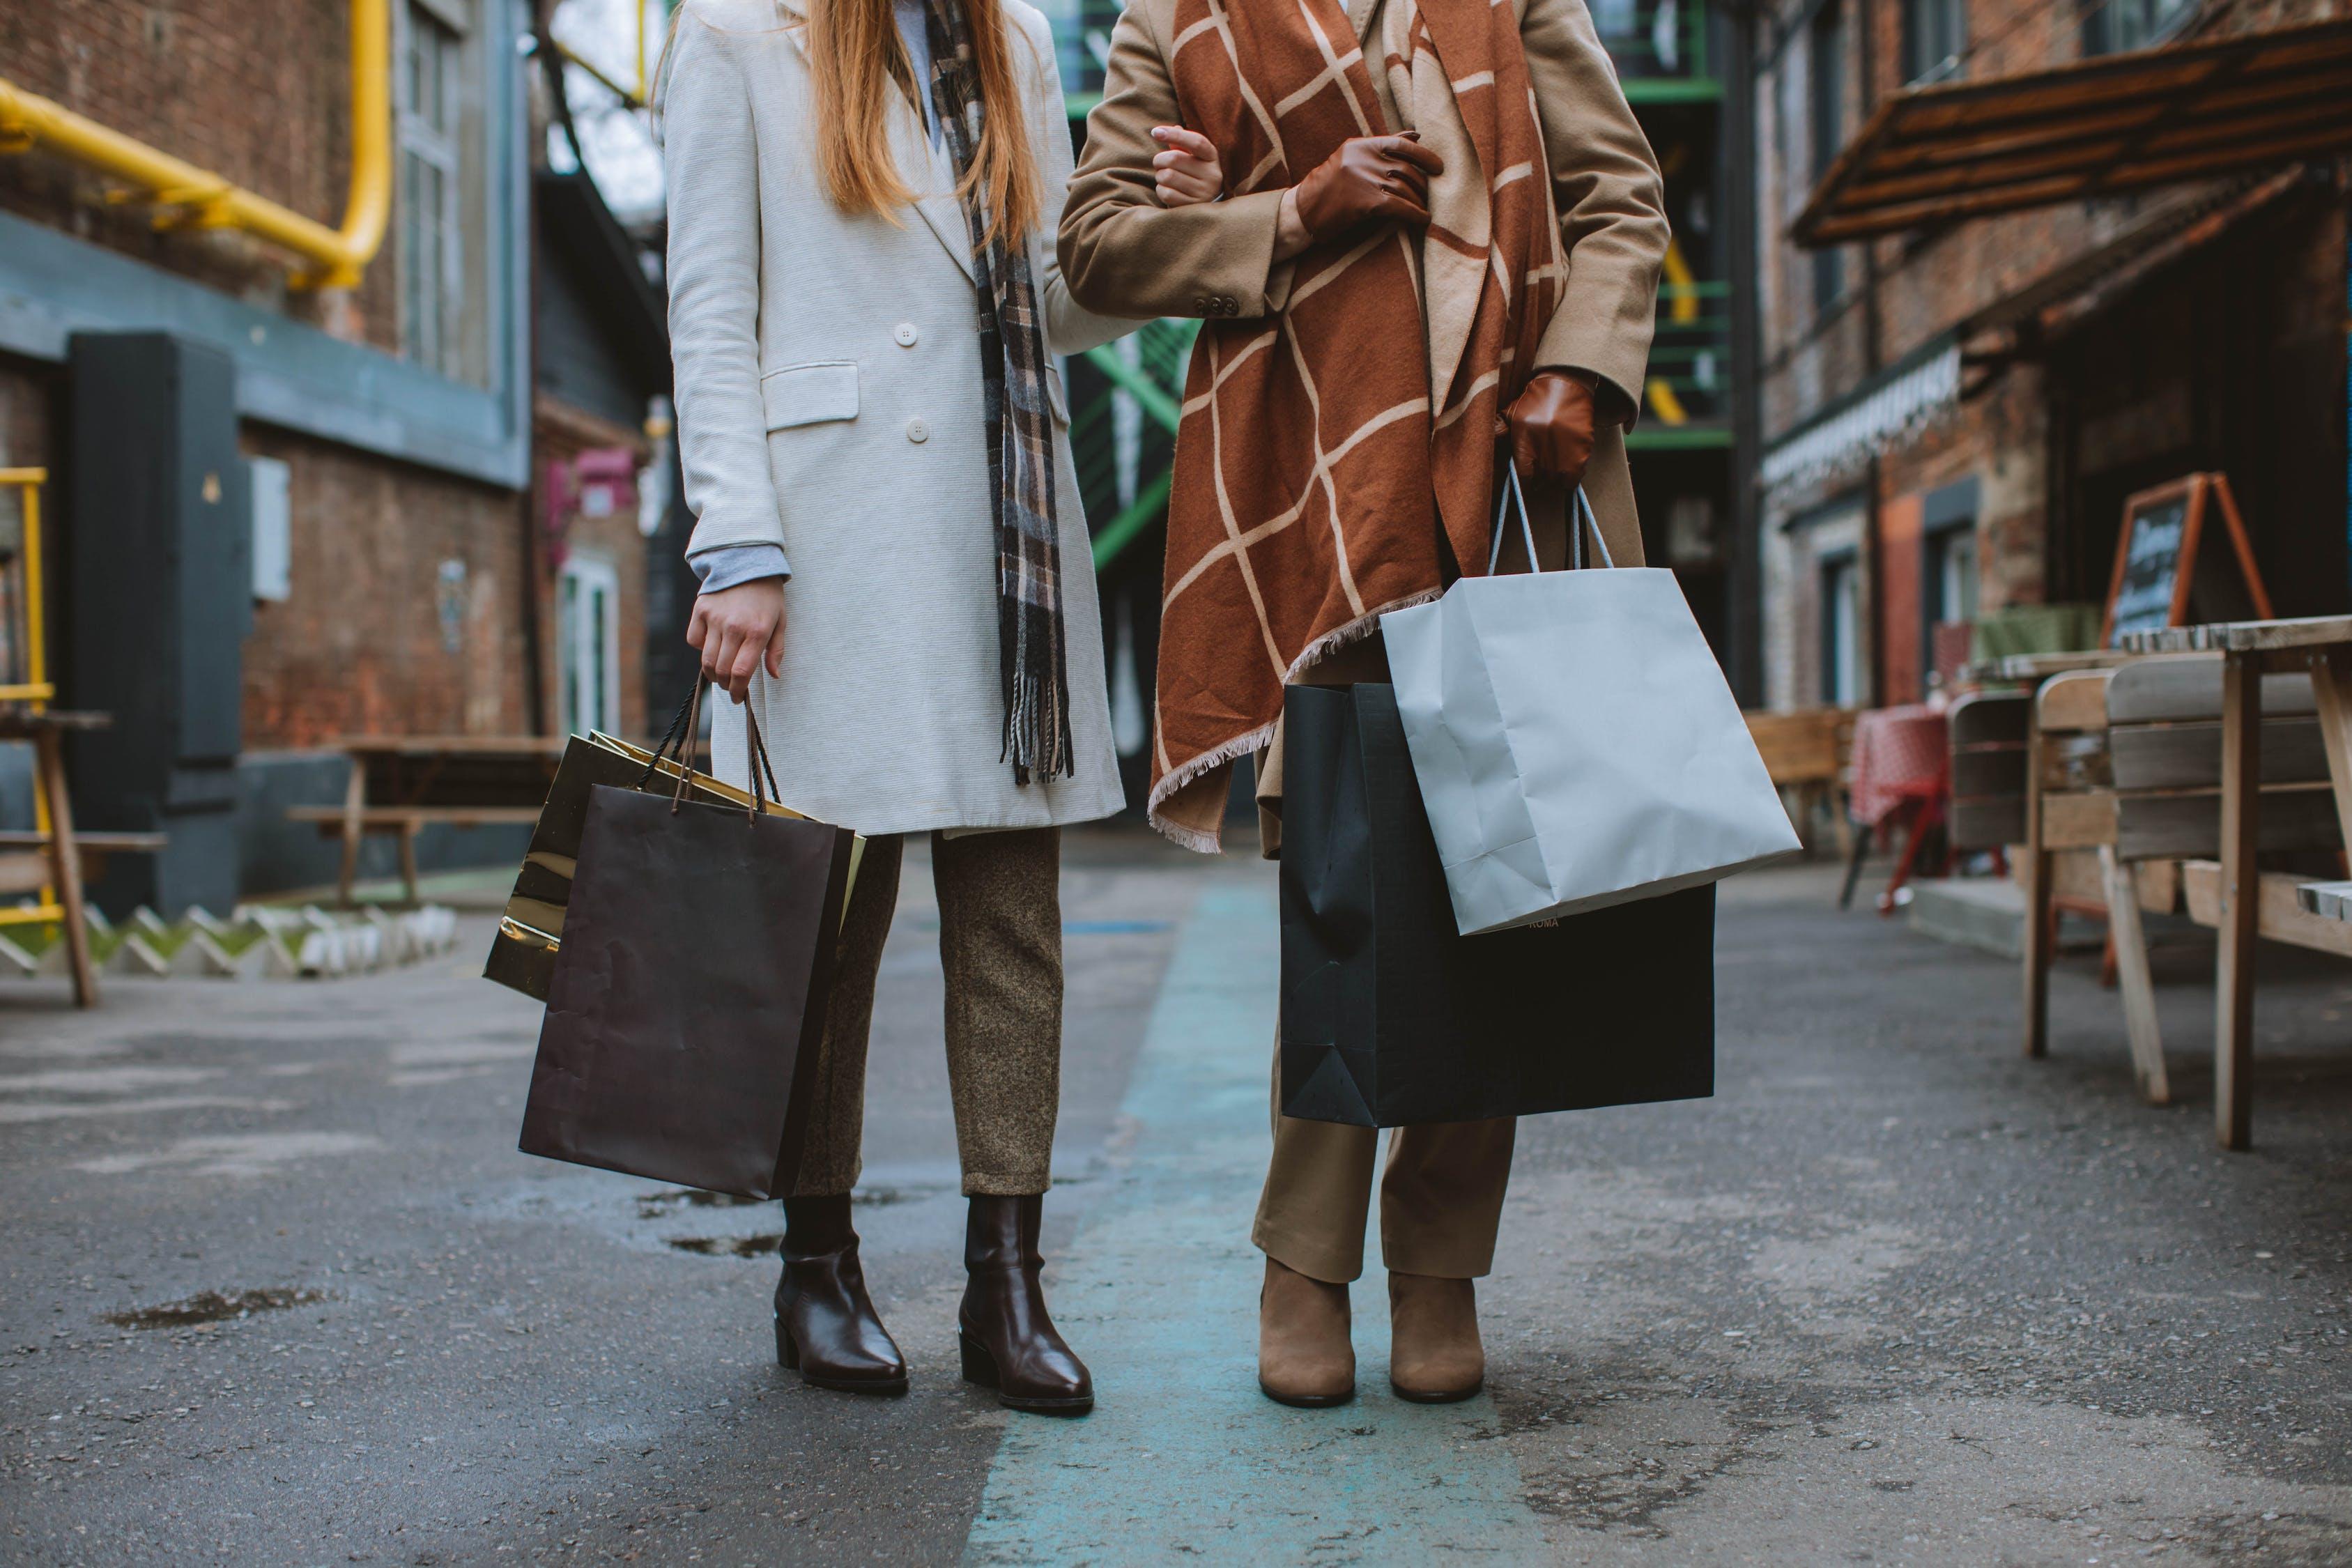 Woman in Brown Coat Holding Black Paper Bag